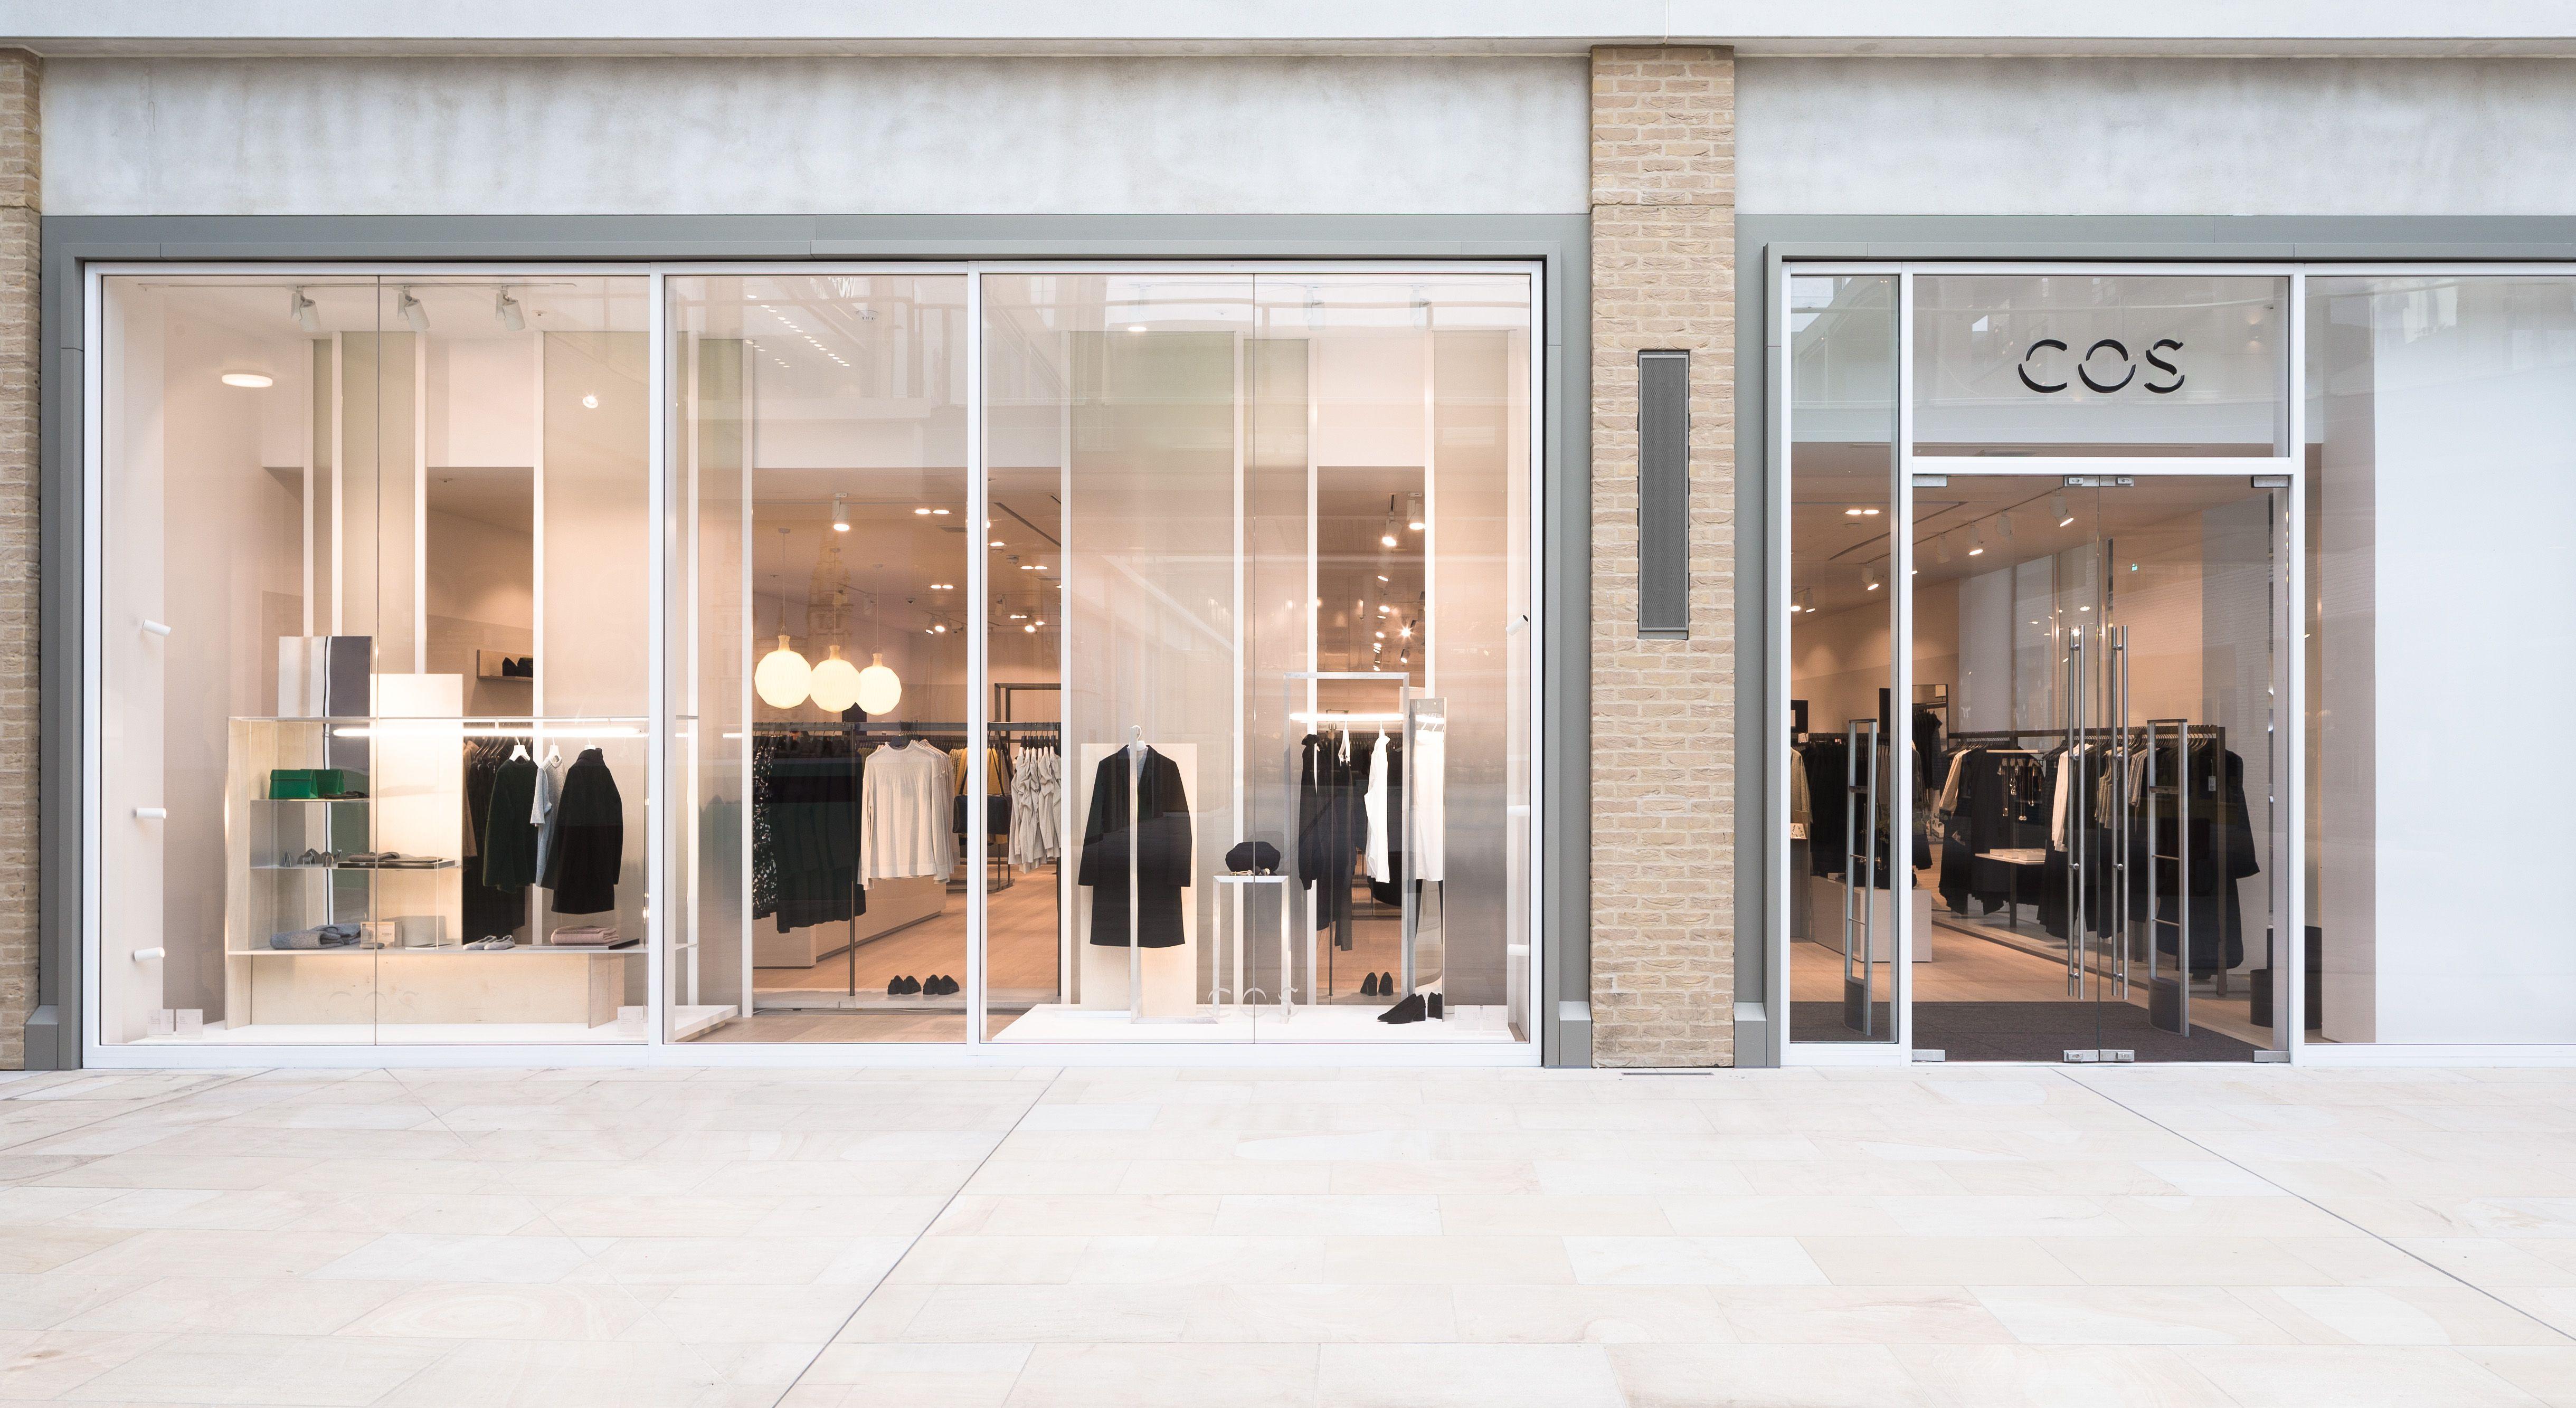 COS | Stores | Westgate, Oxford | Cos stores, Facade design, Architecture